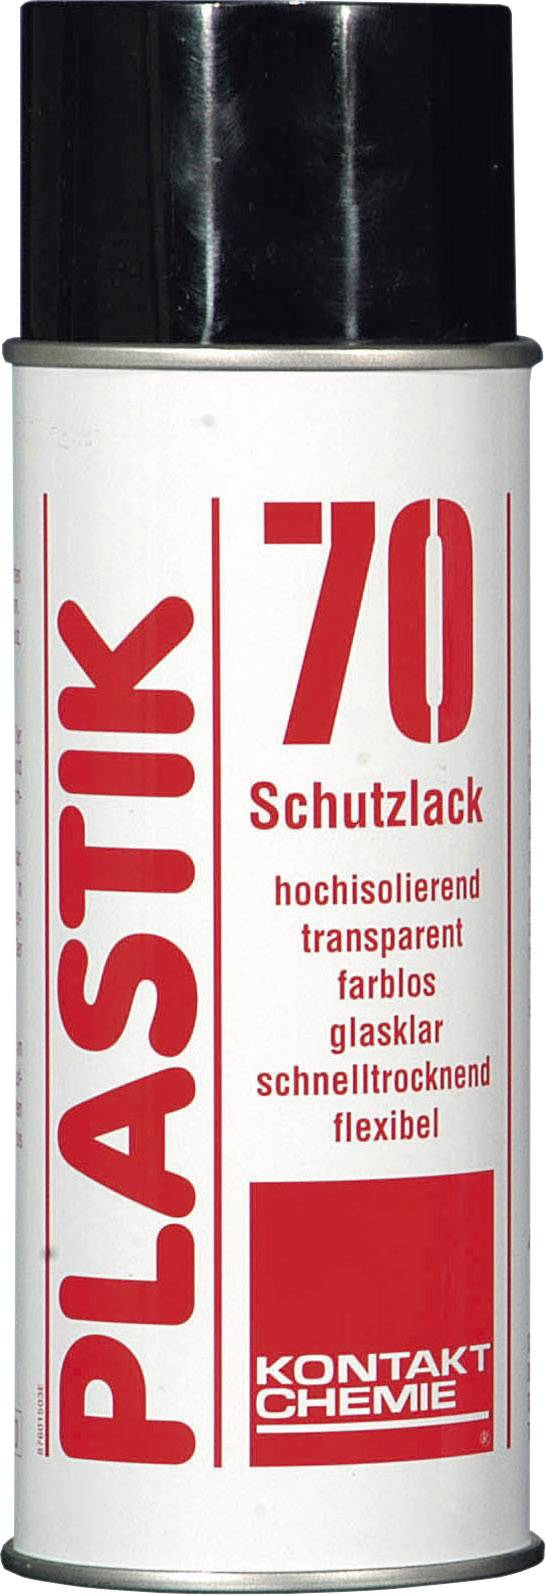 Izolační a ochranný lak na DPS CRC Kontakt Chemie PLASTIK 70 74309-AA, 200 ml